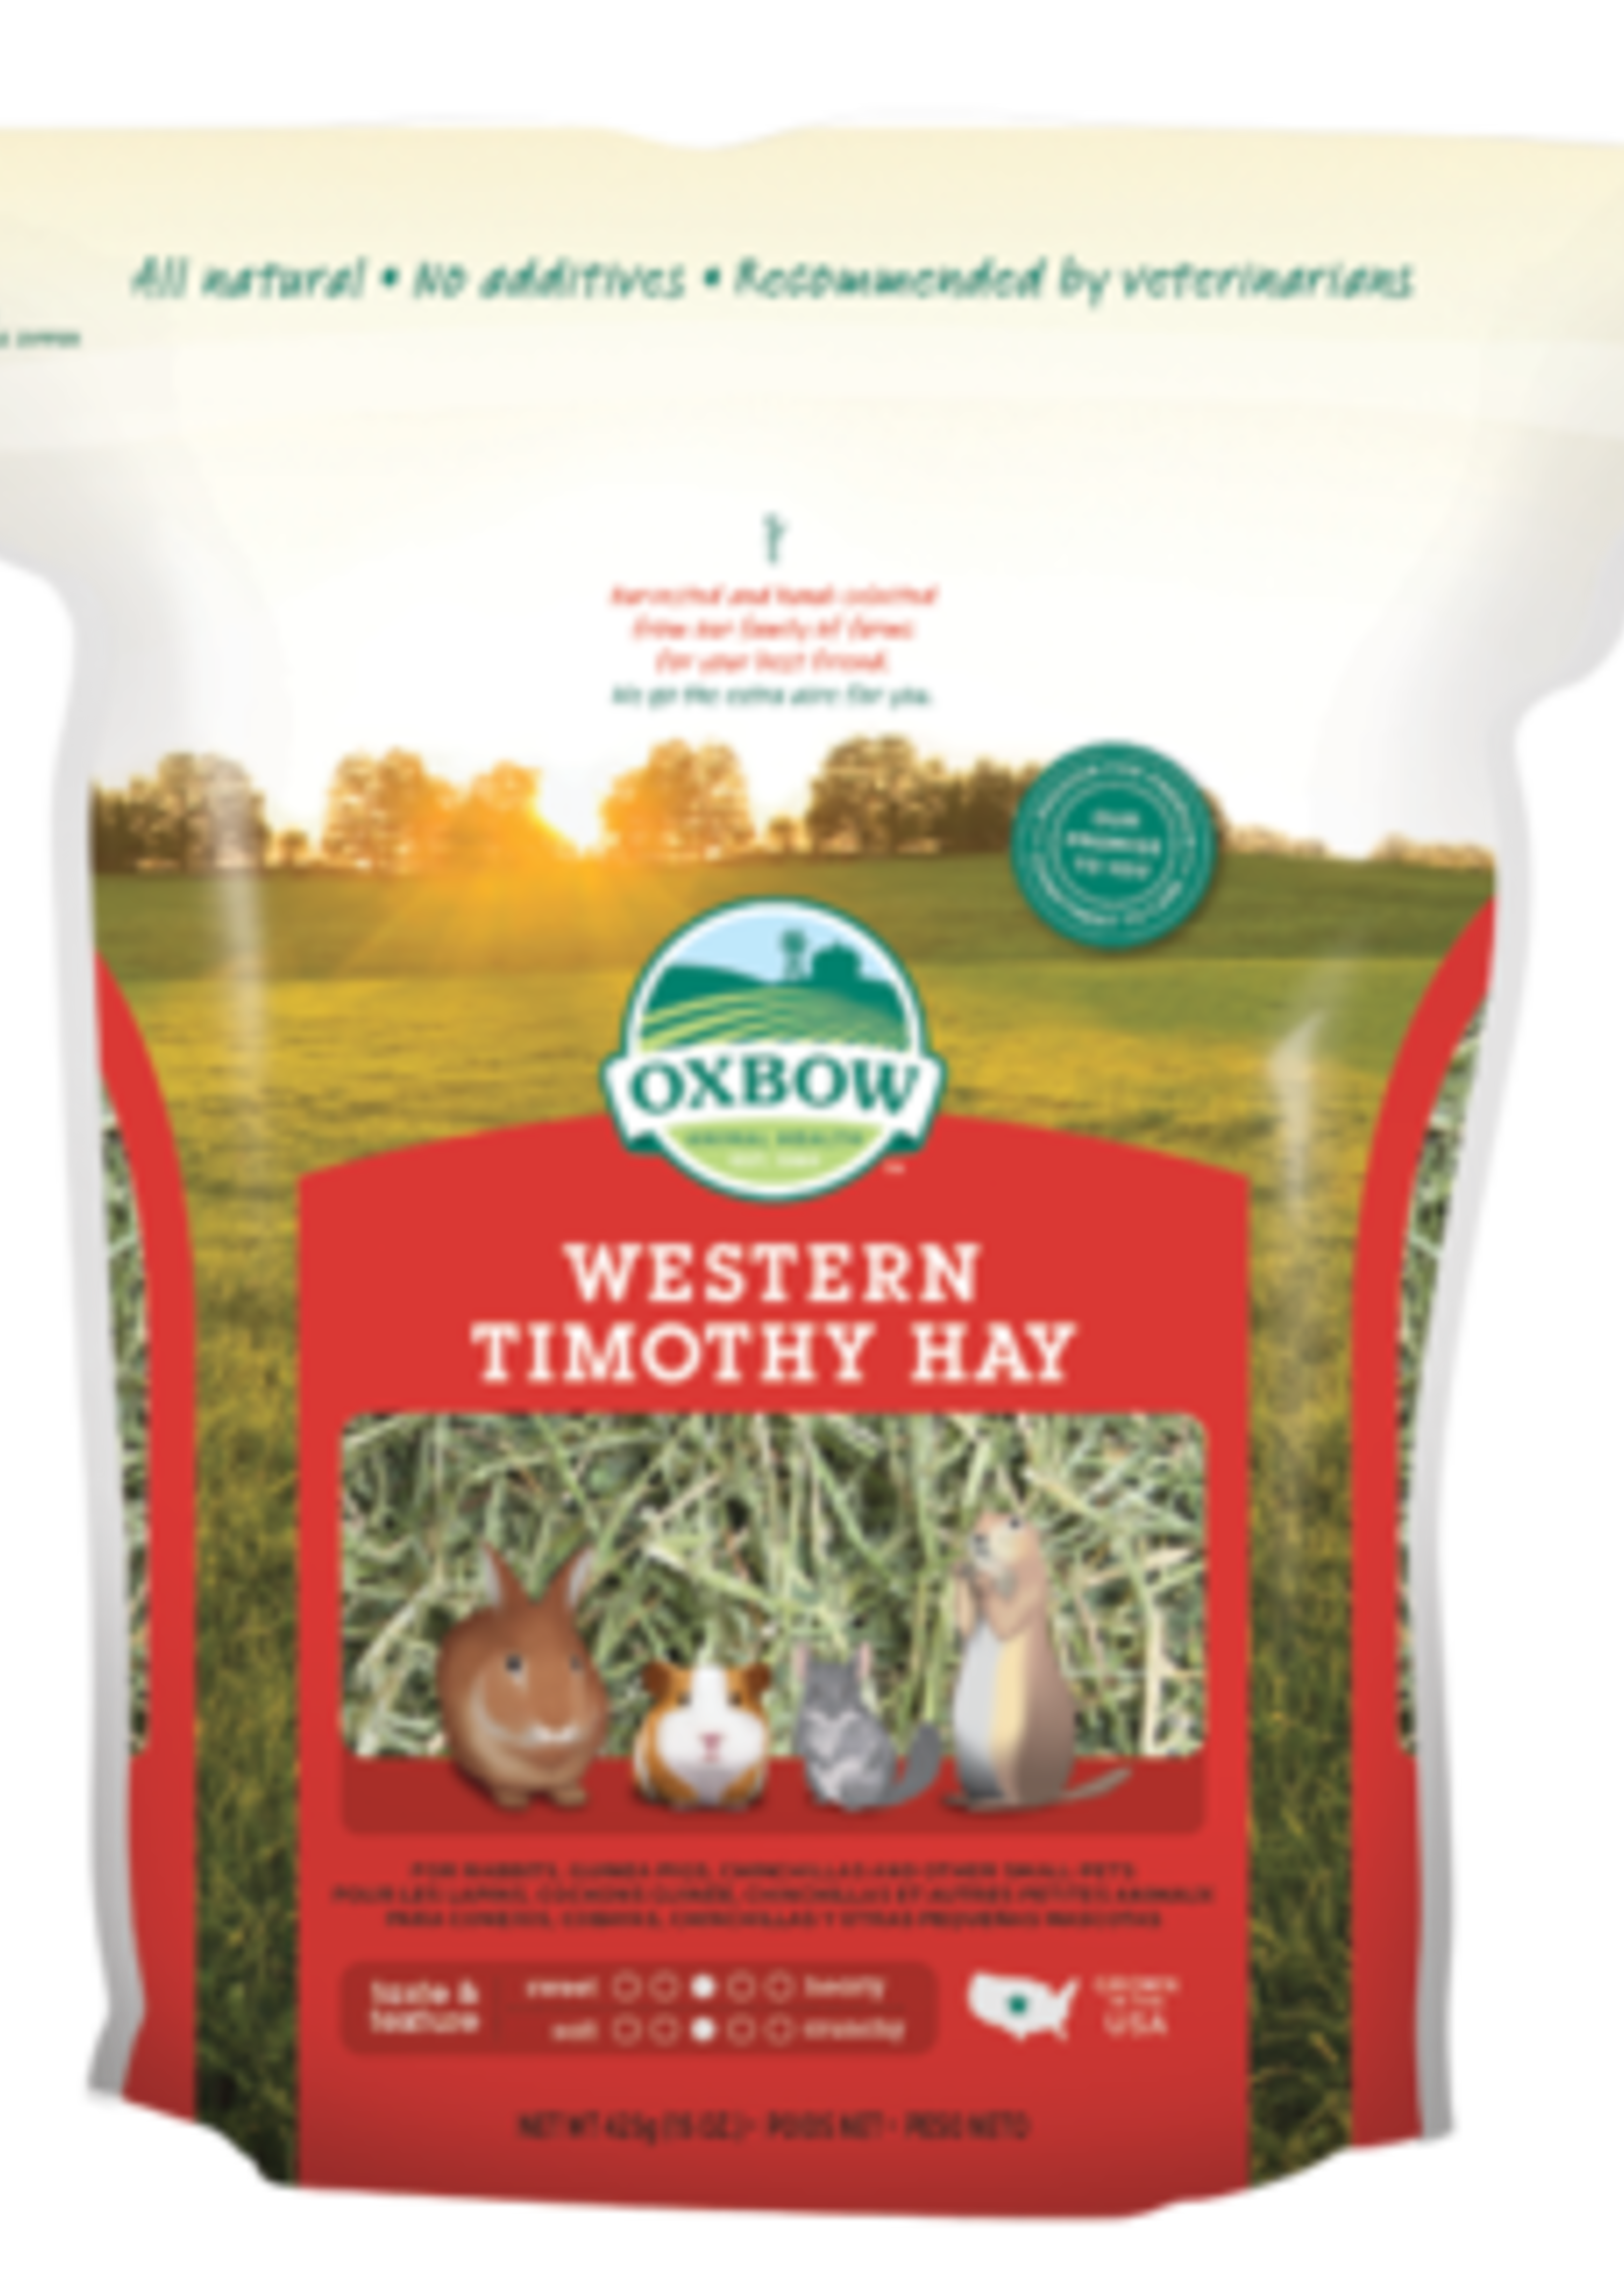 Oxbow Animal Health™ OXBOW WESTERN TIMOTHY HAY 9LB